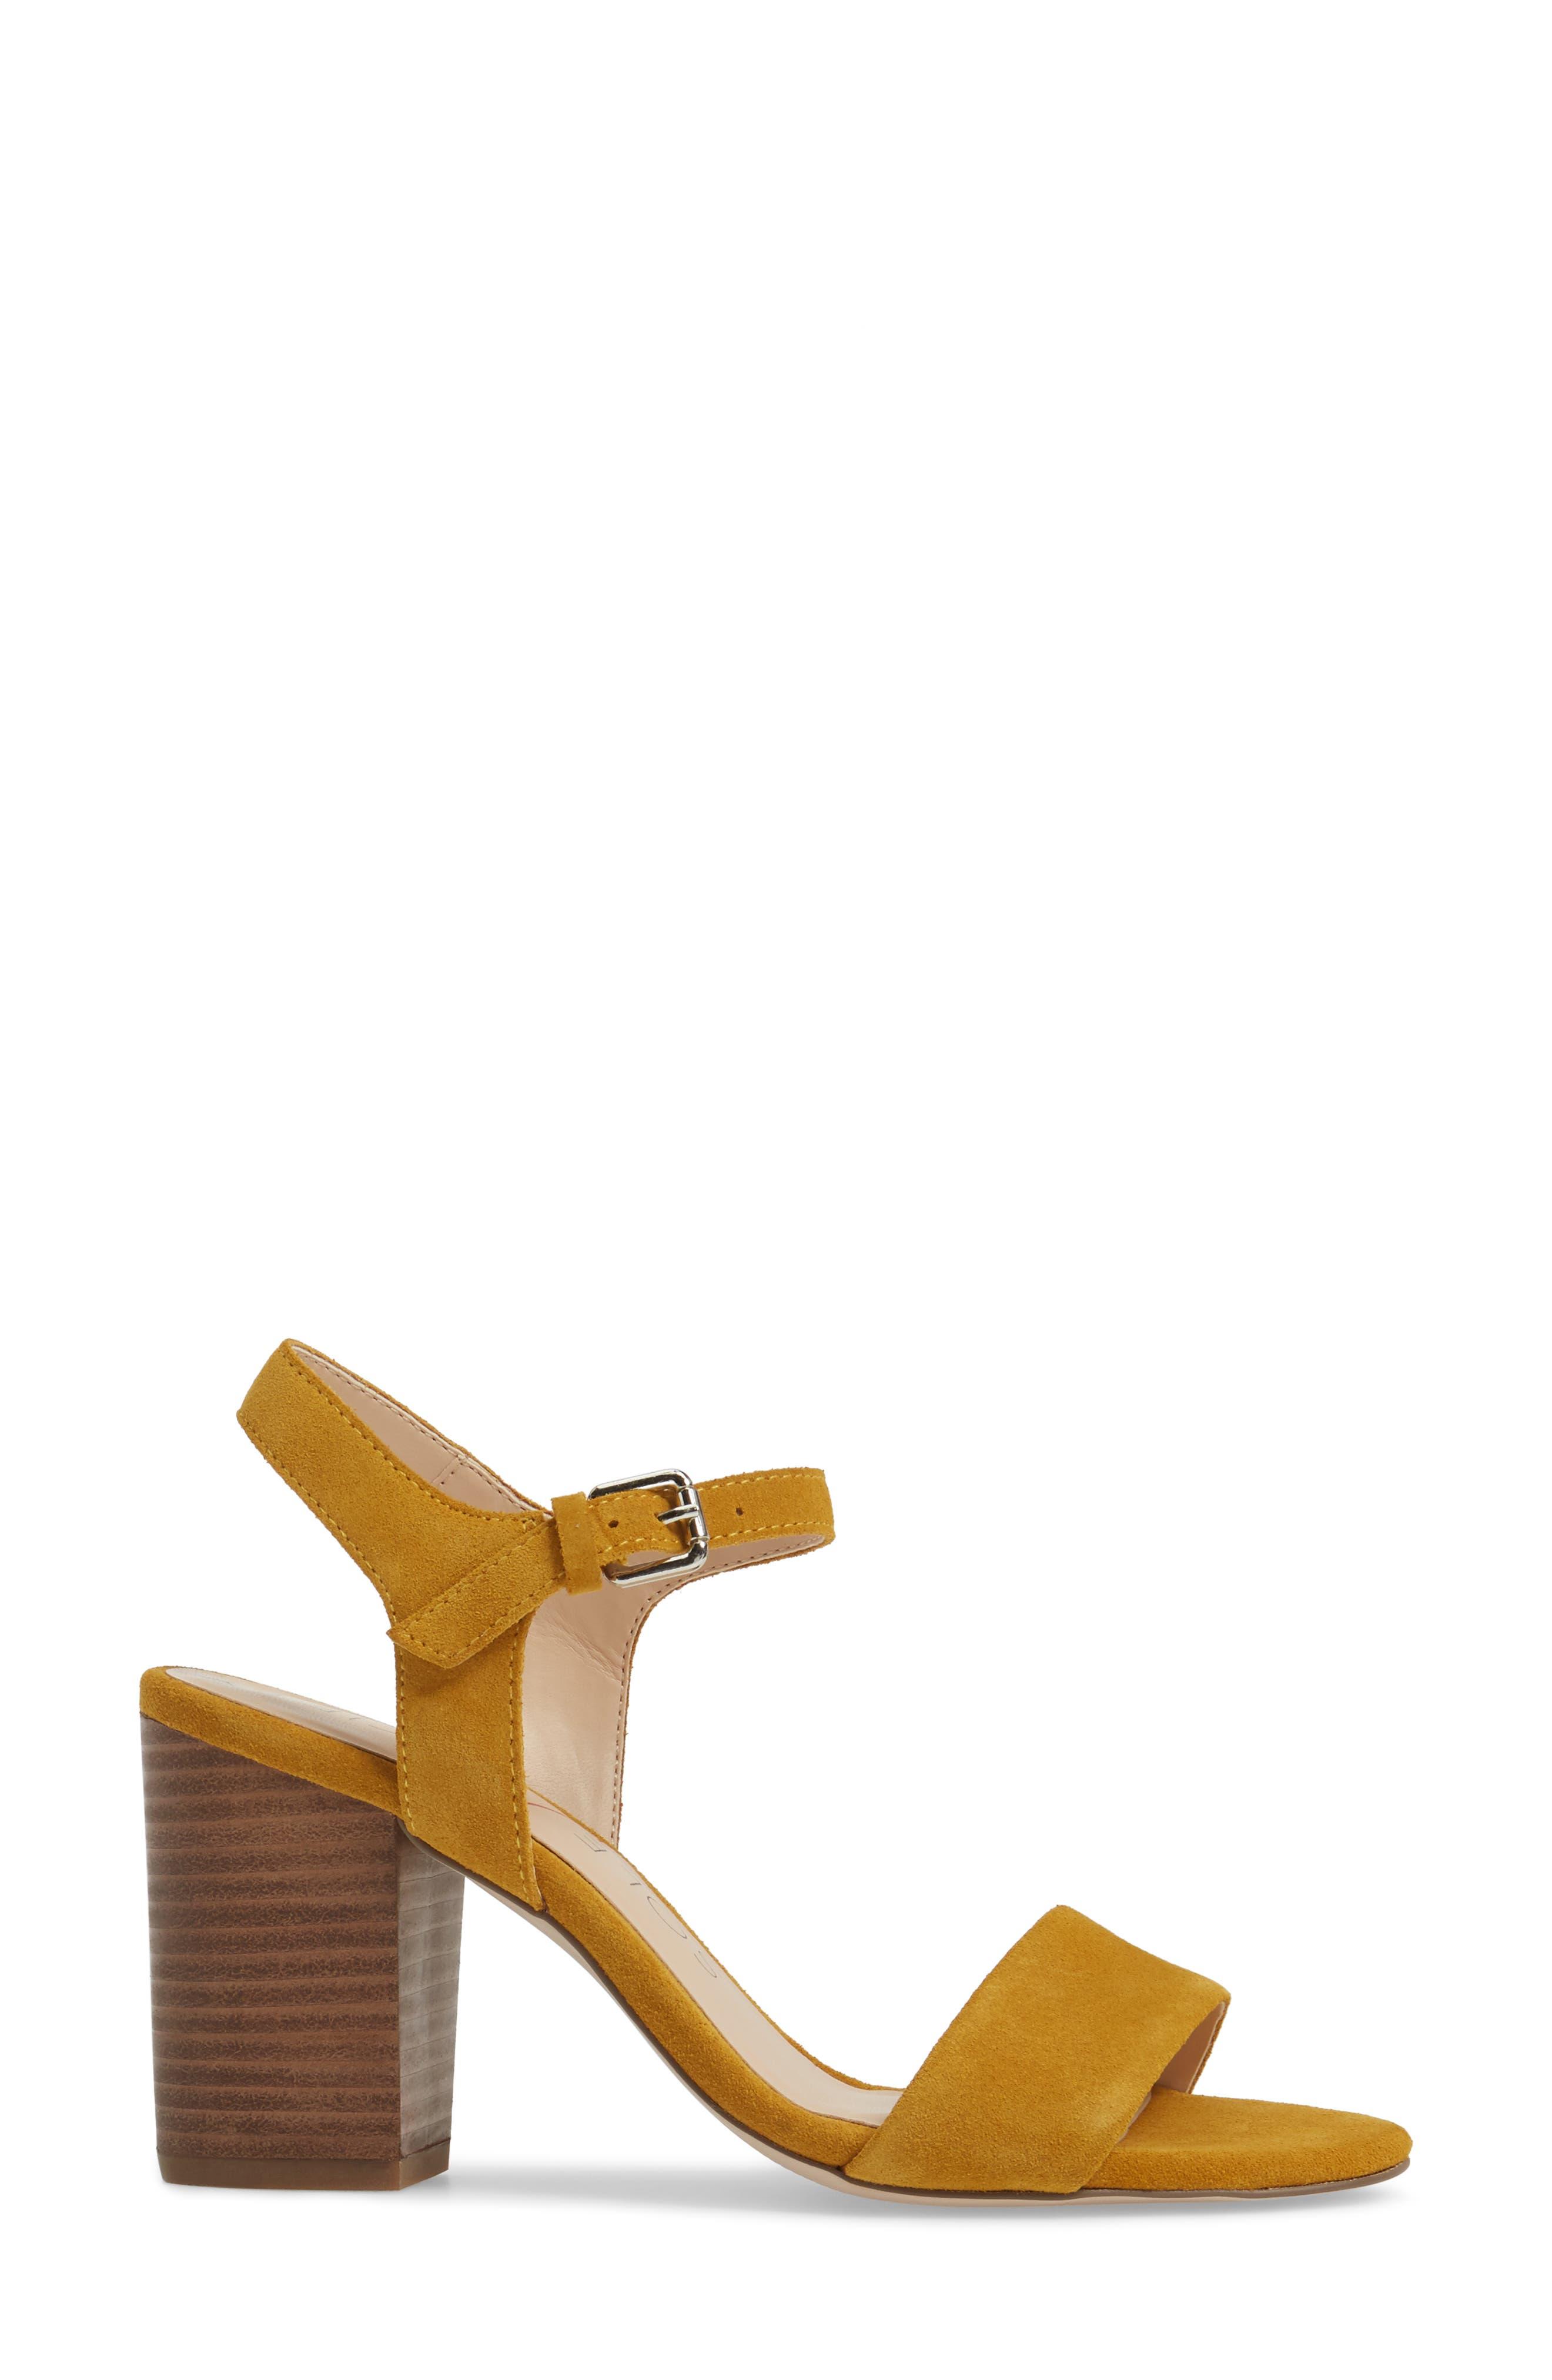 'Linny' Ankle Strap Sandal,                             Alternate thumbnail 15, color,